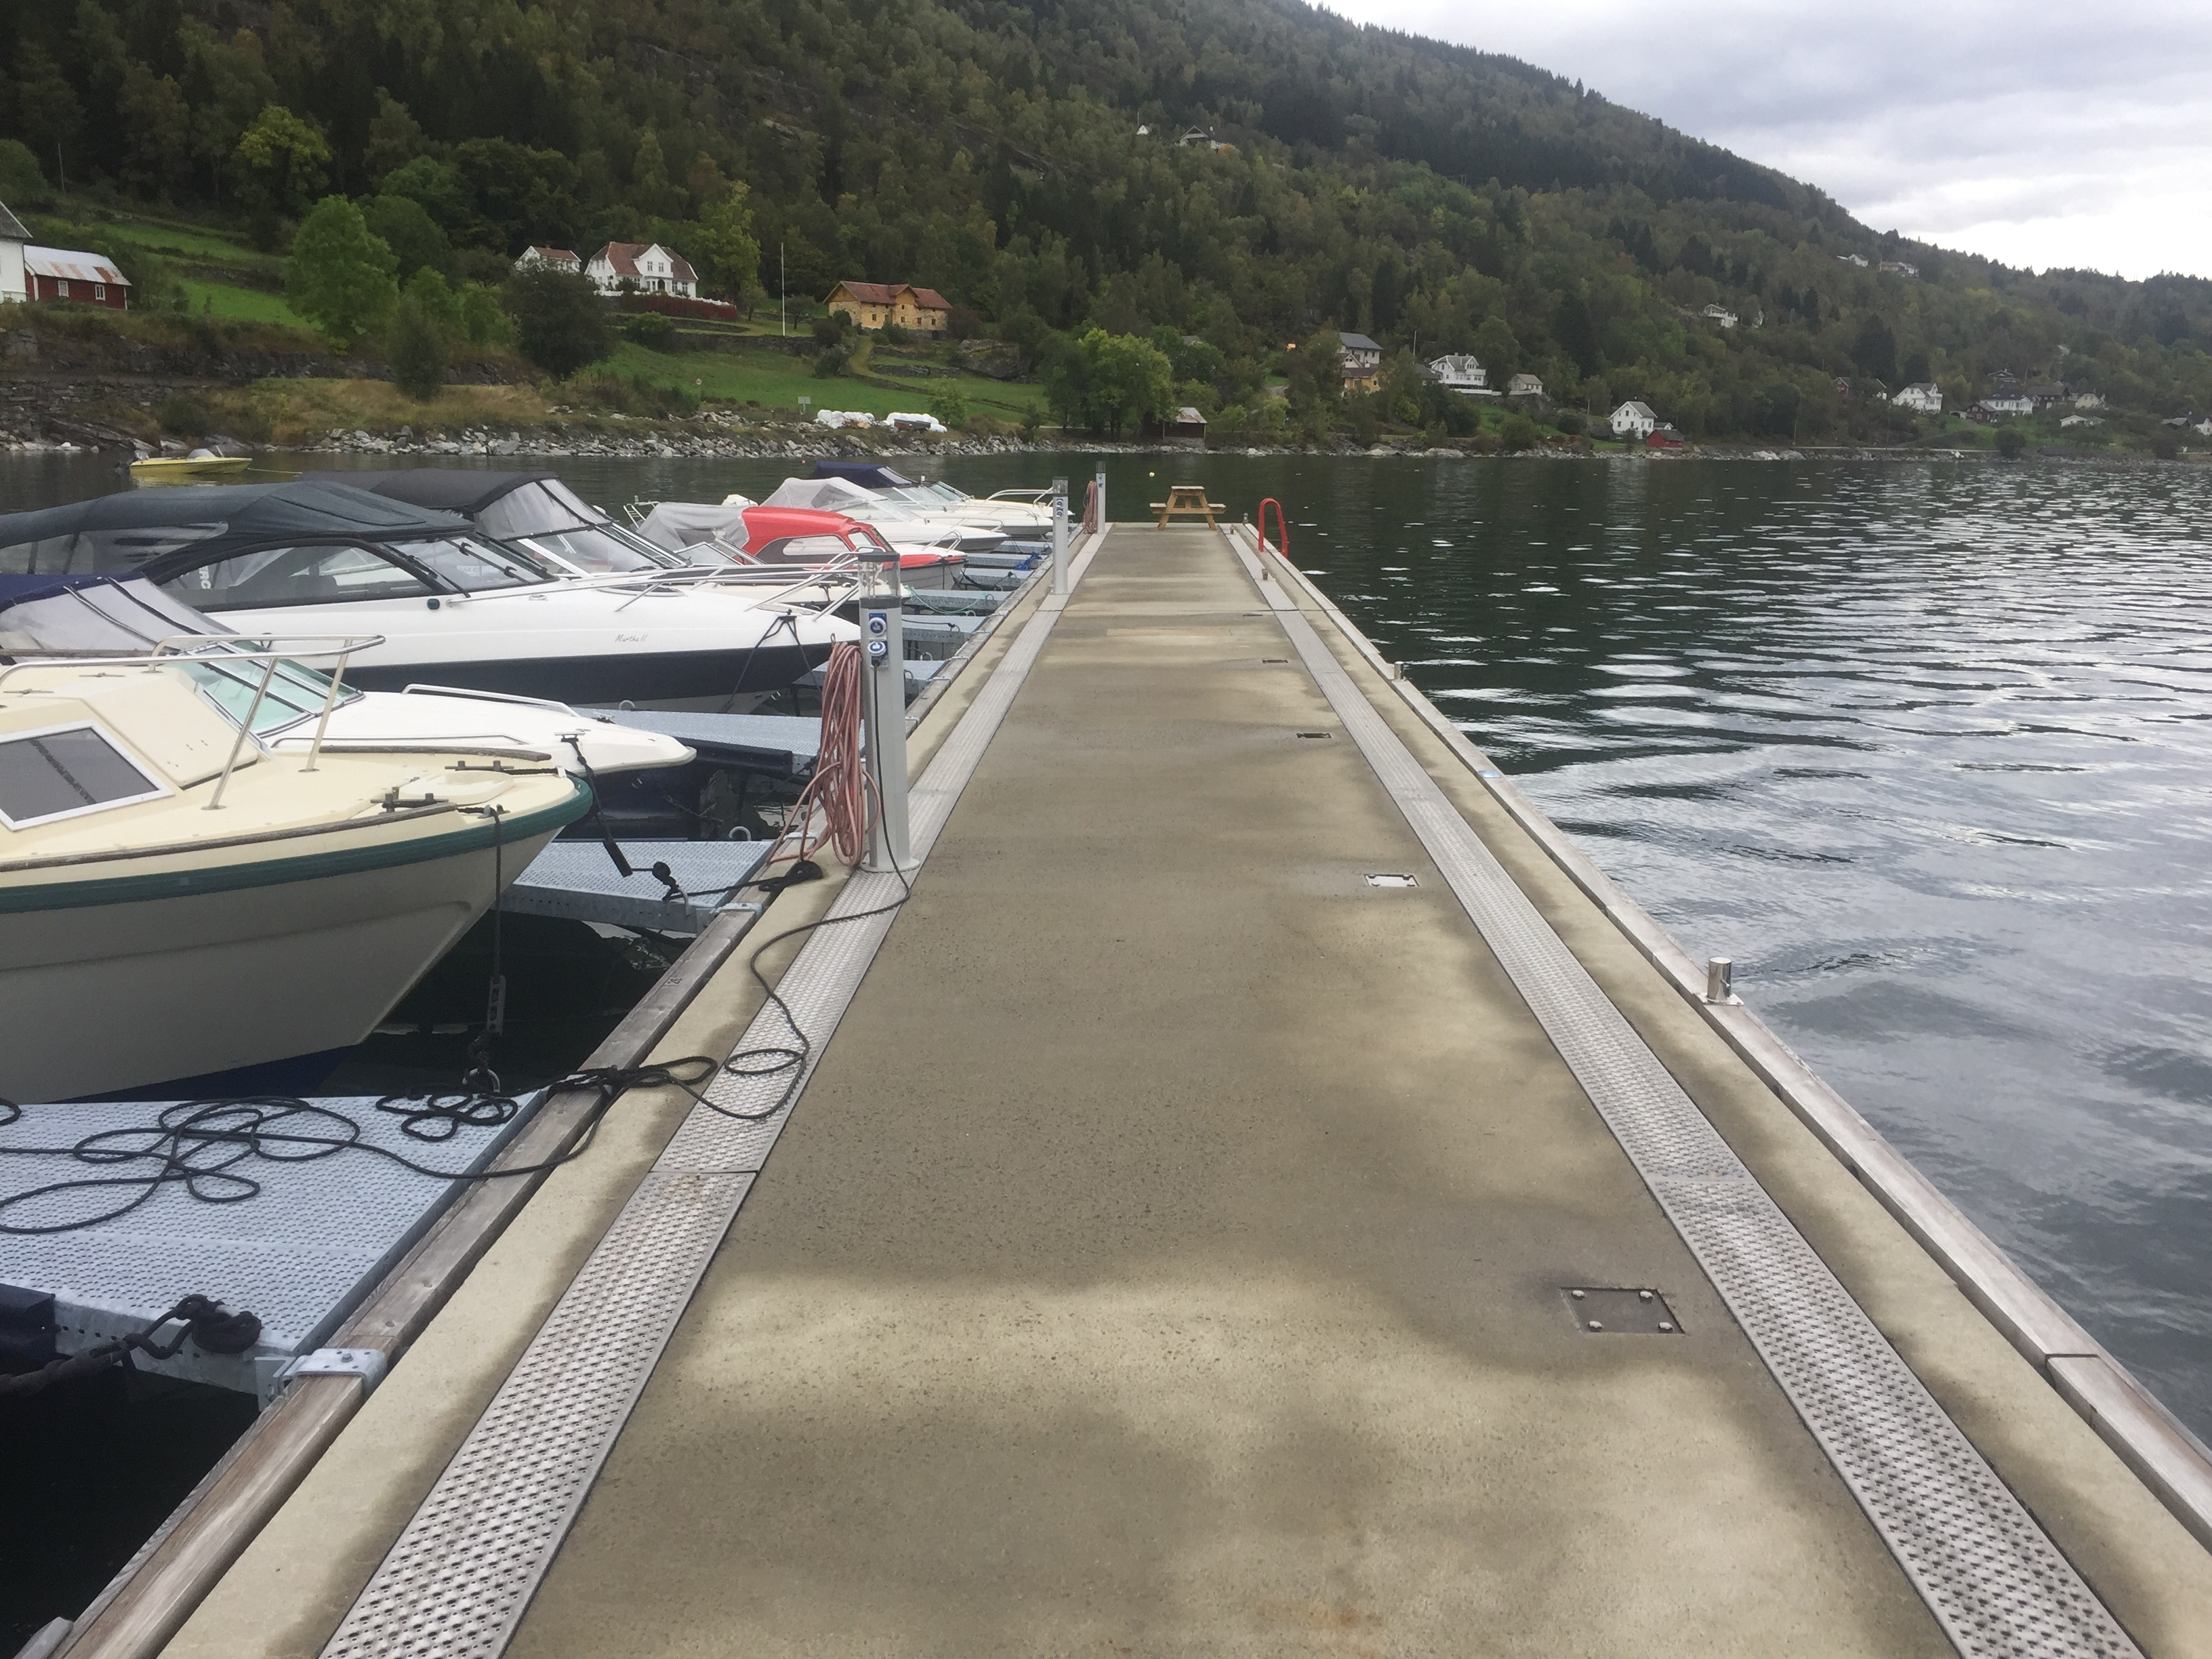 https://www.marinasolutions.no/uploads/HØyheimsvik-båtlag-3.JPG